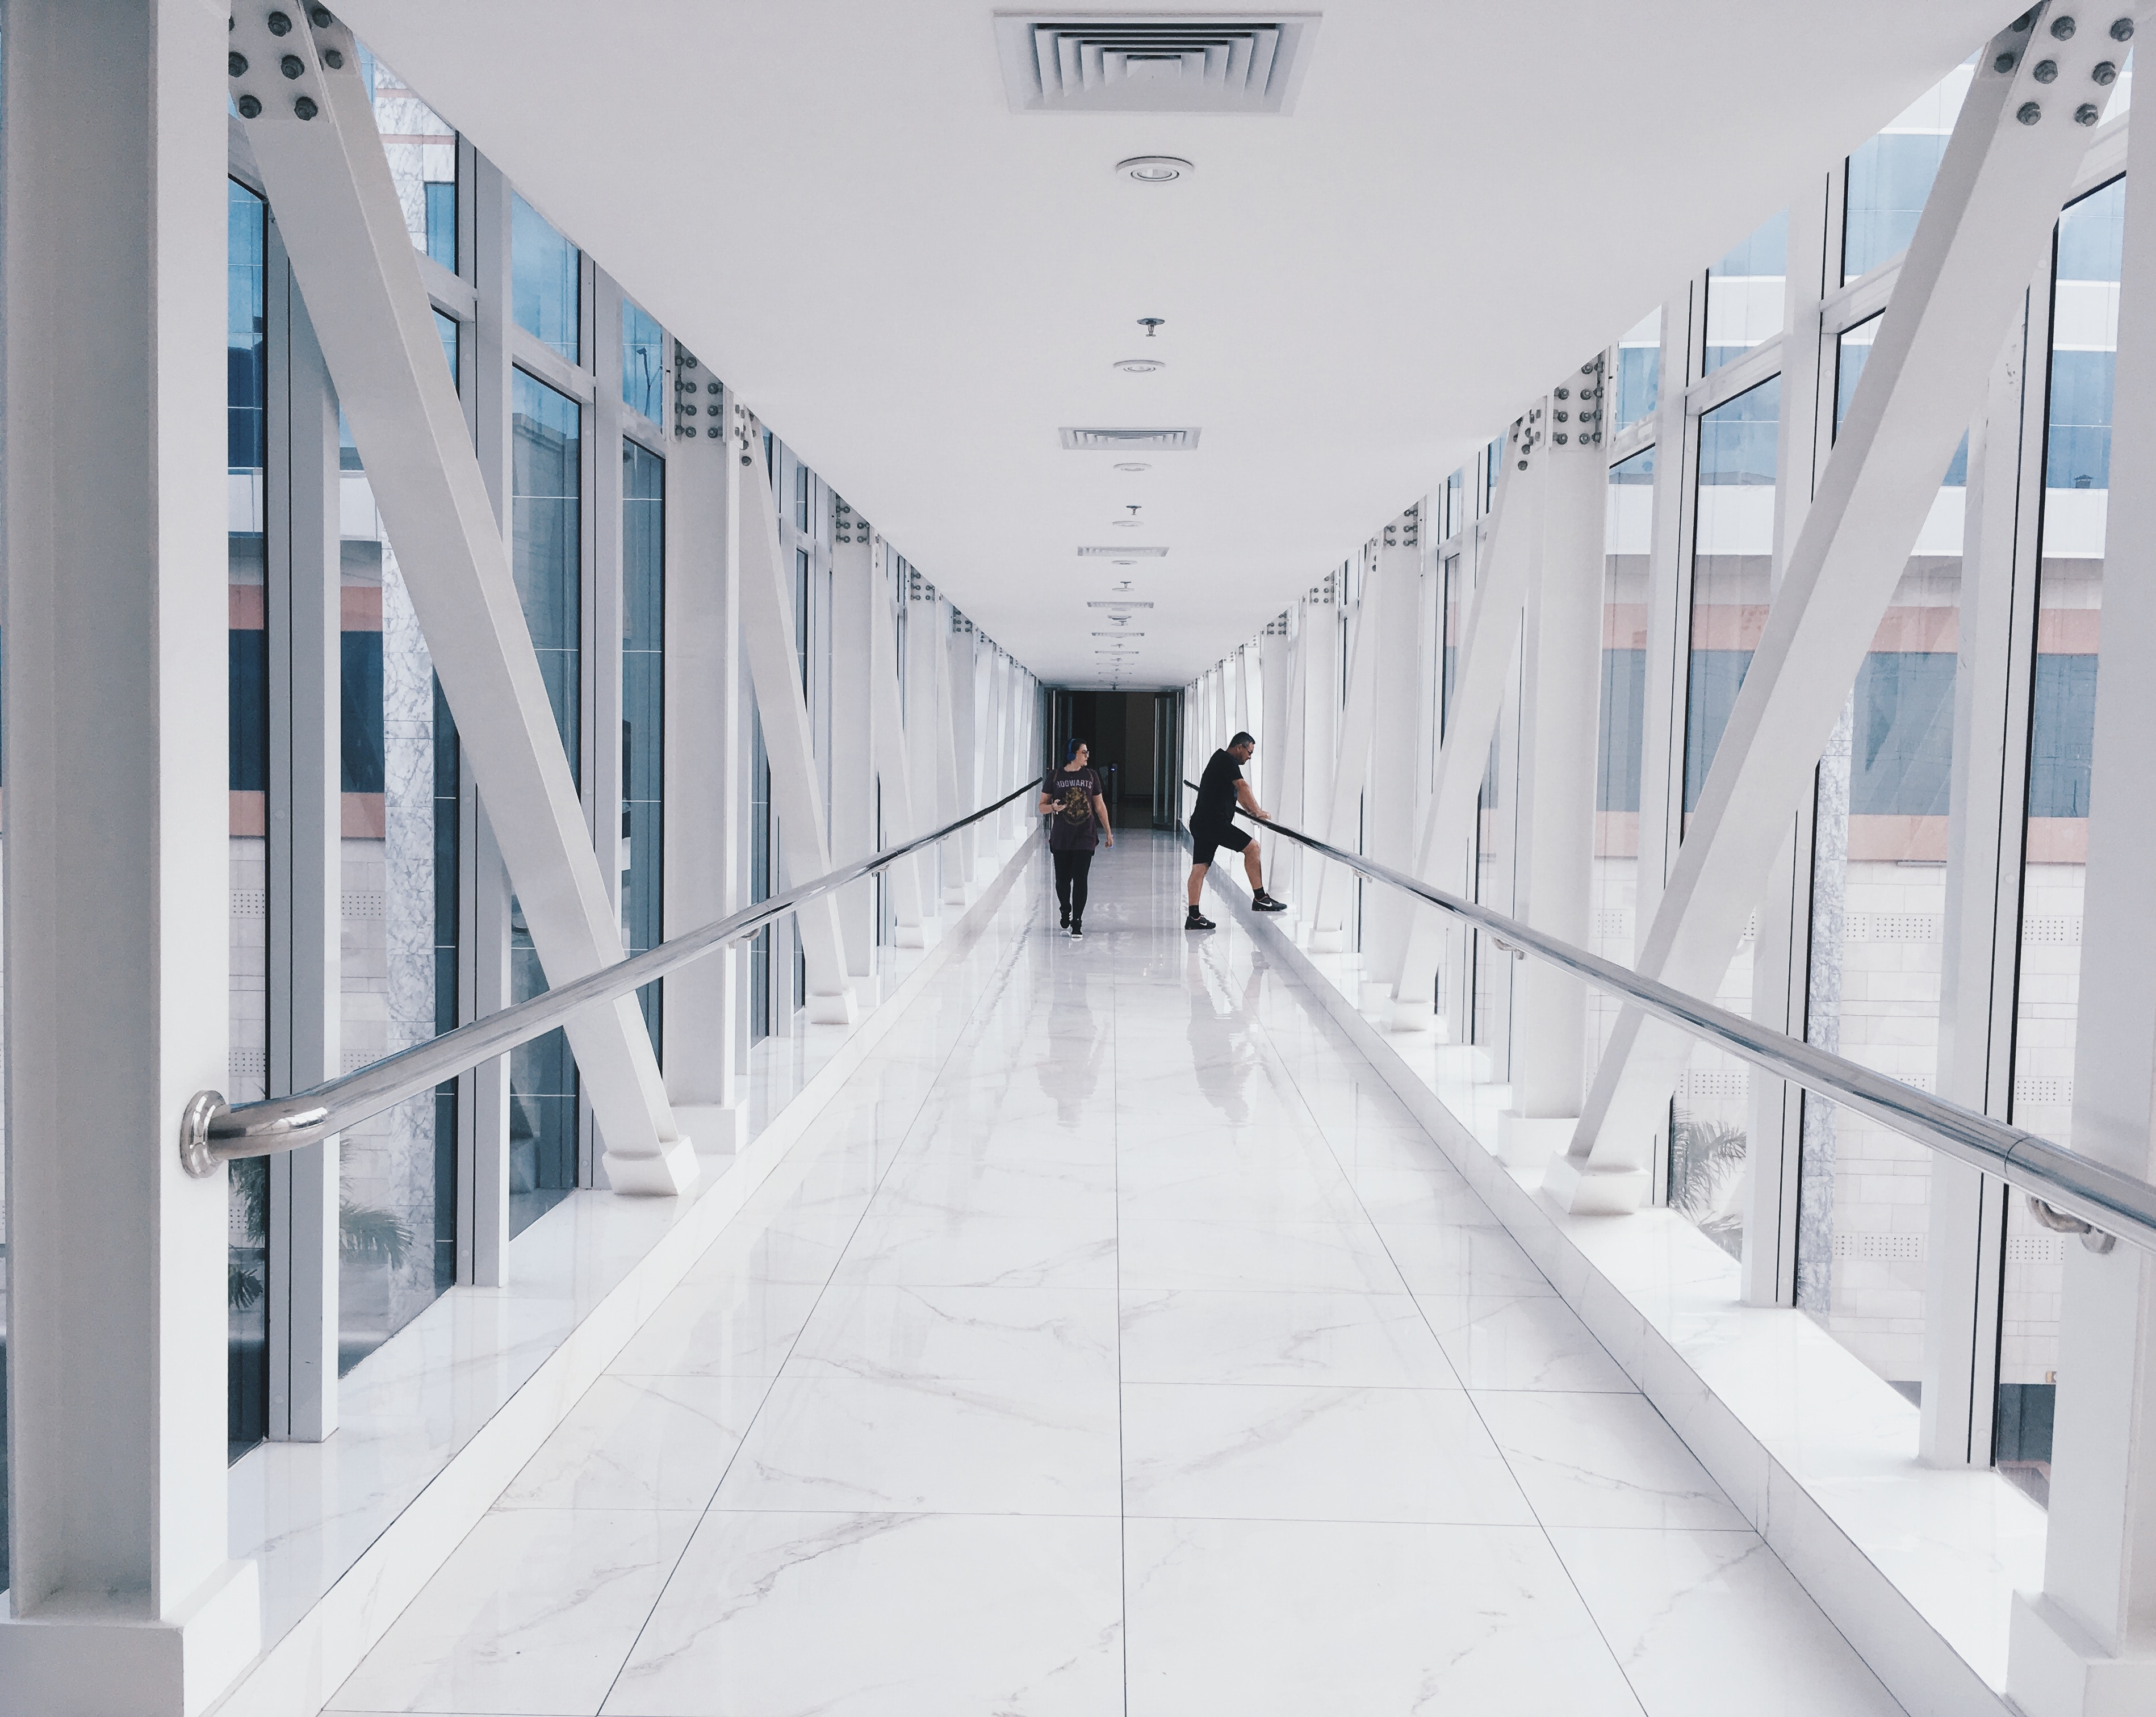 architecture-building-hallway-894144